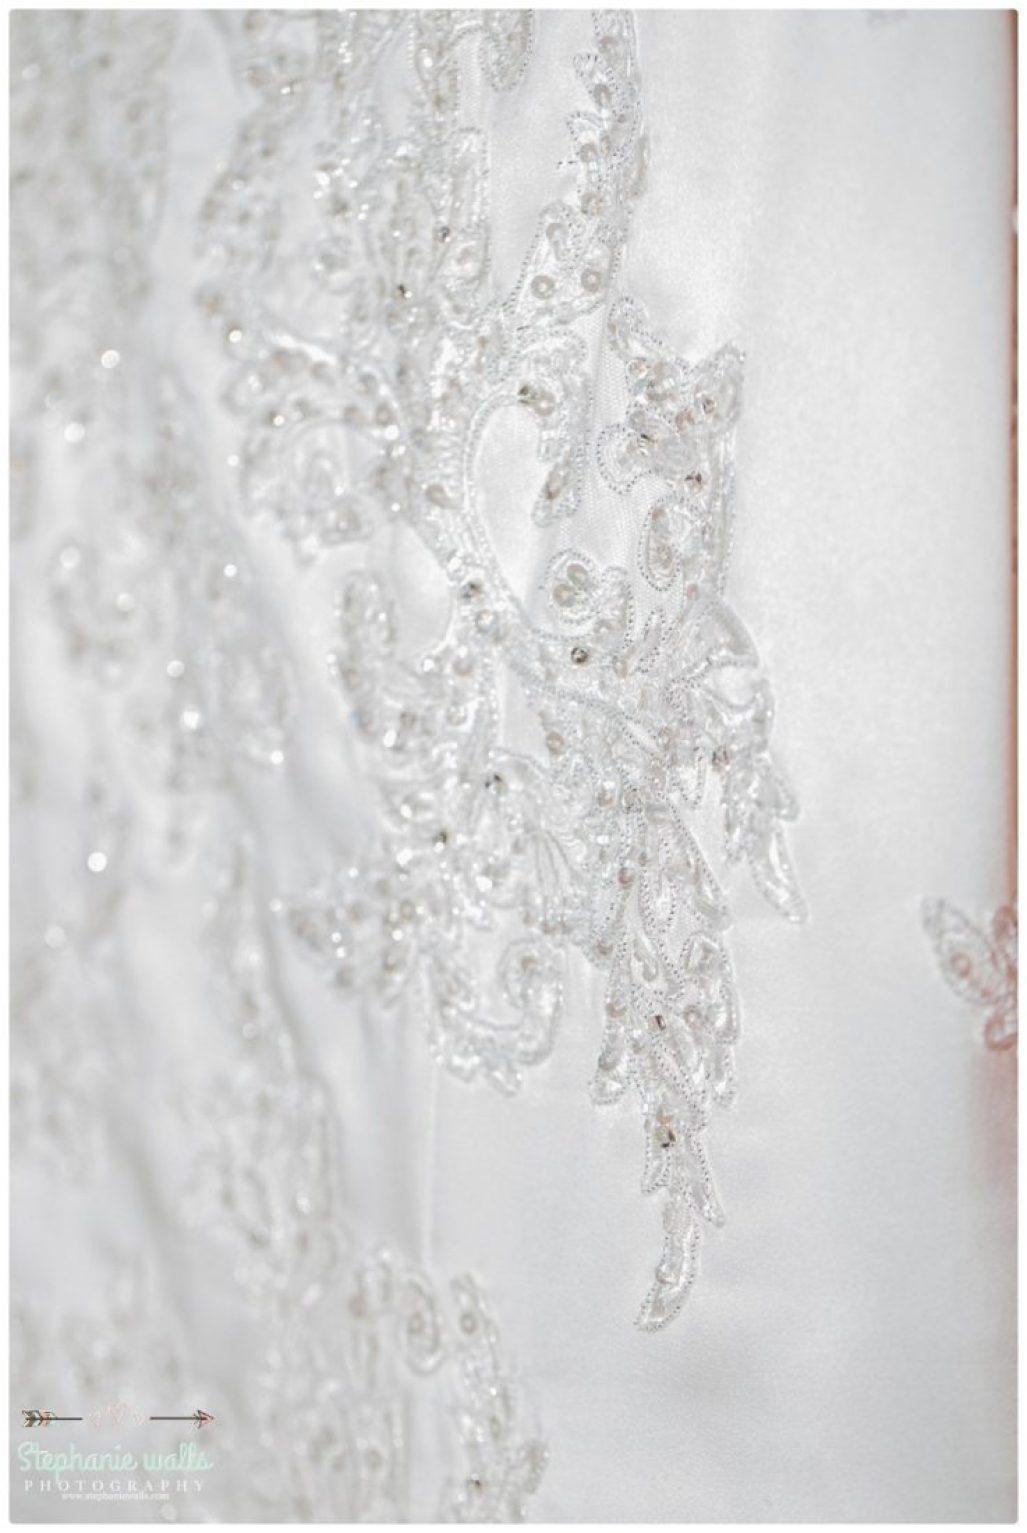 2016 03 24 0069 Racing Love   Snohomish Event Center   Snohomish Wedding Photographer